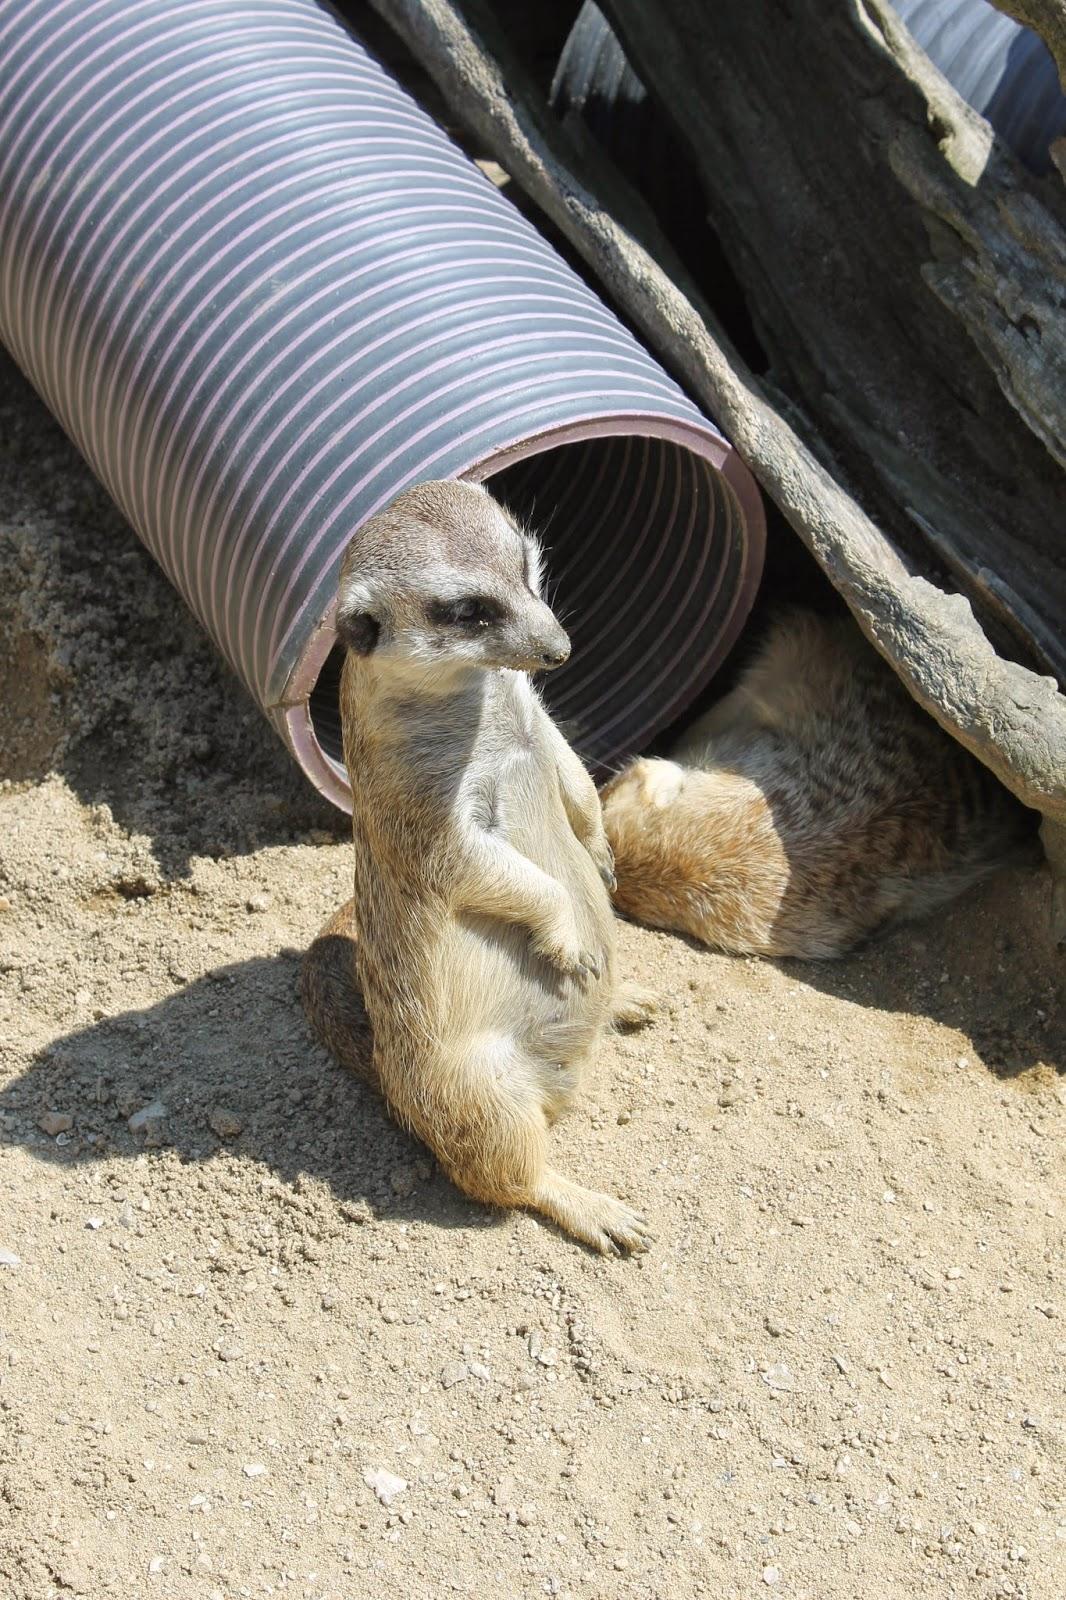 Seoul Zoo, Seoul, зоопарк в сеуле, сеул, корея, зоопарк, сурикат